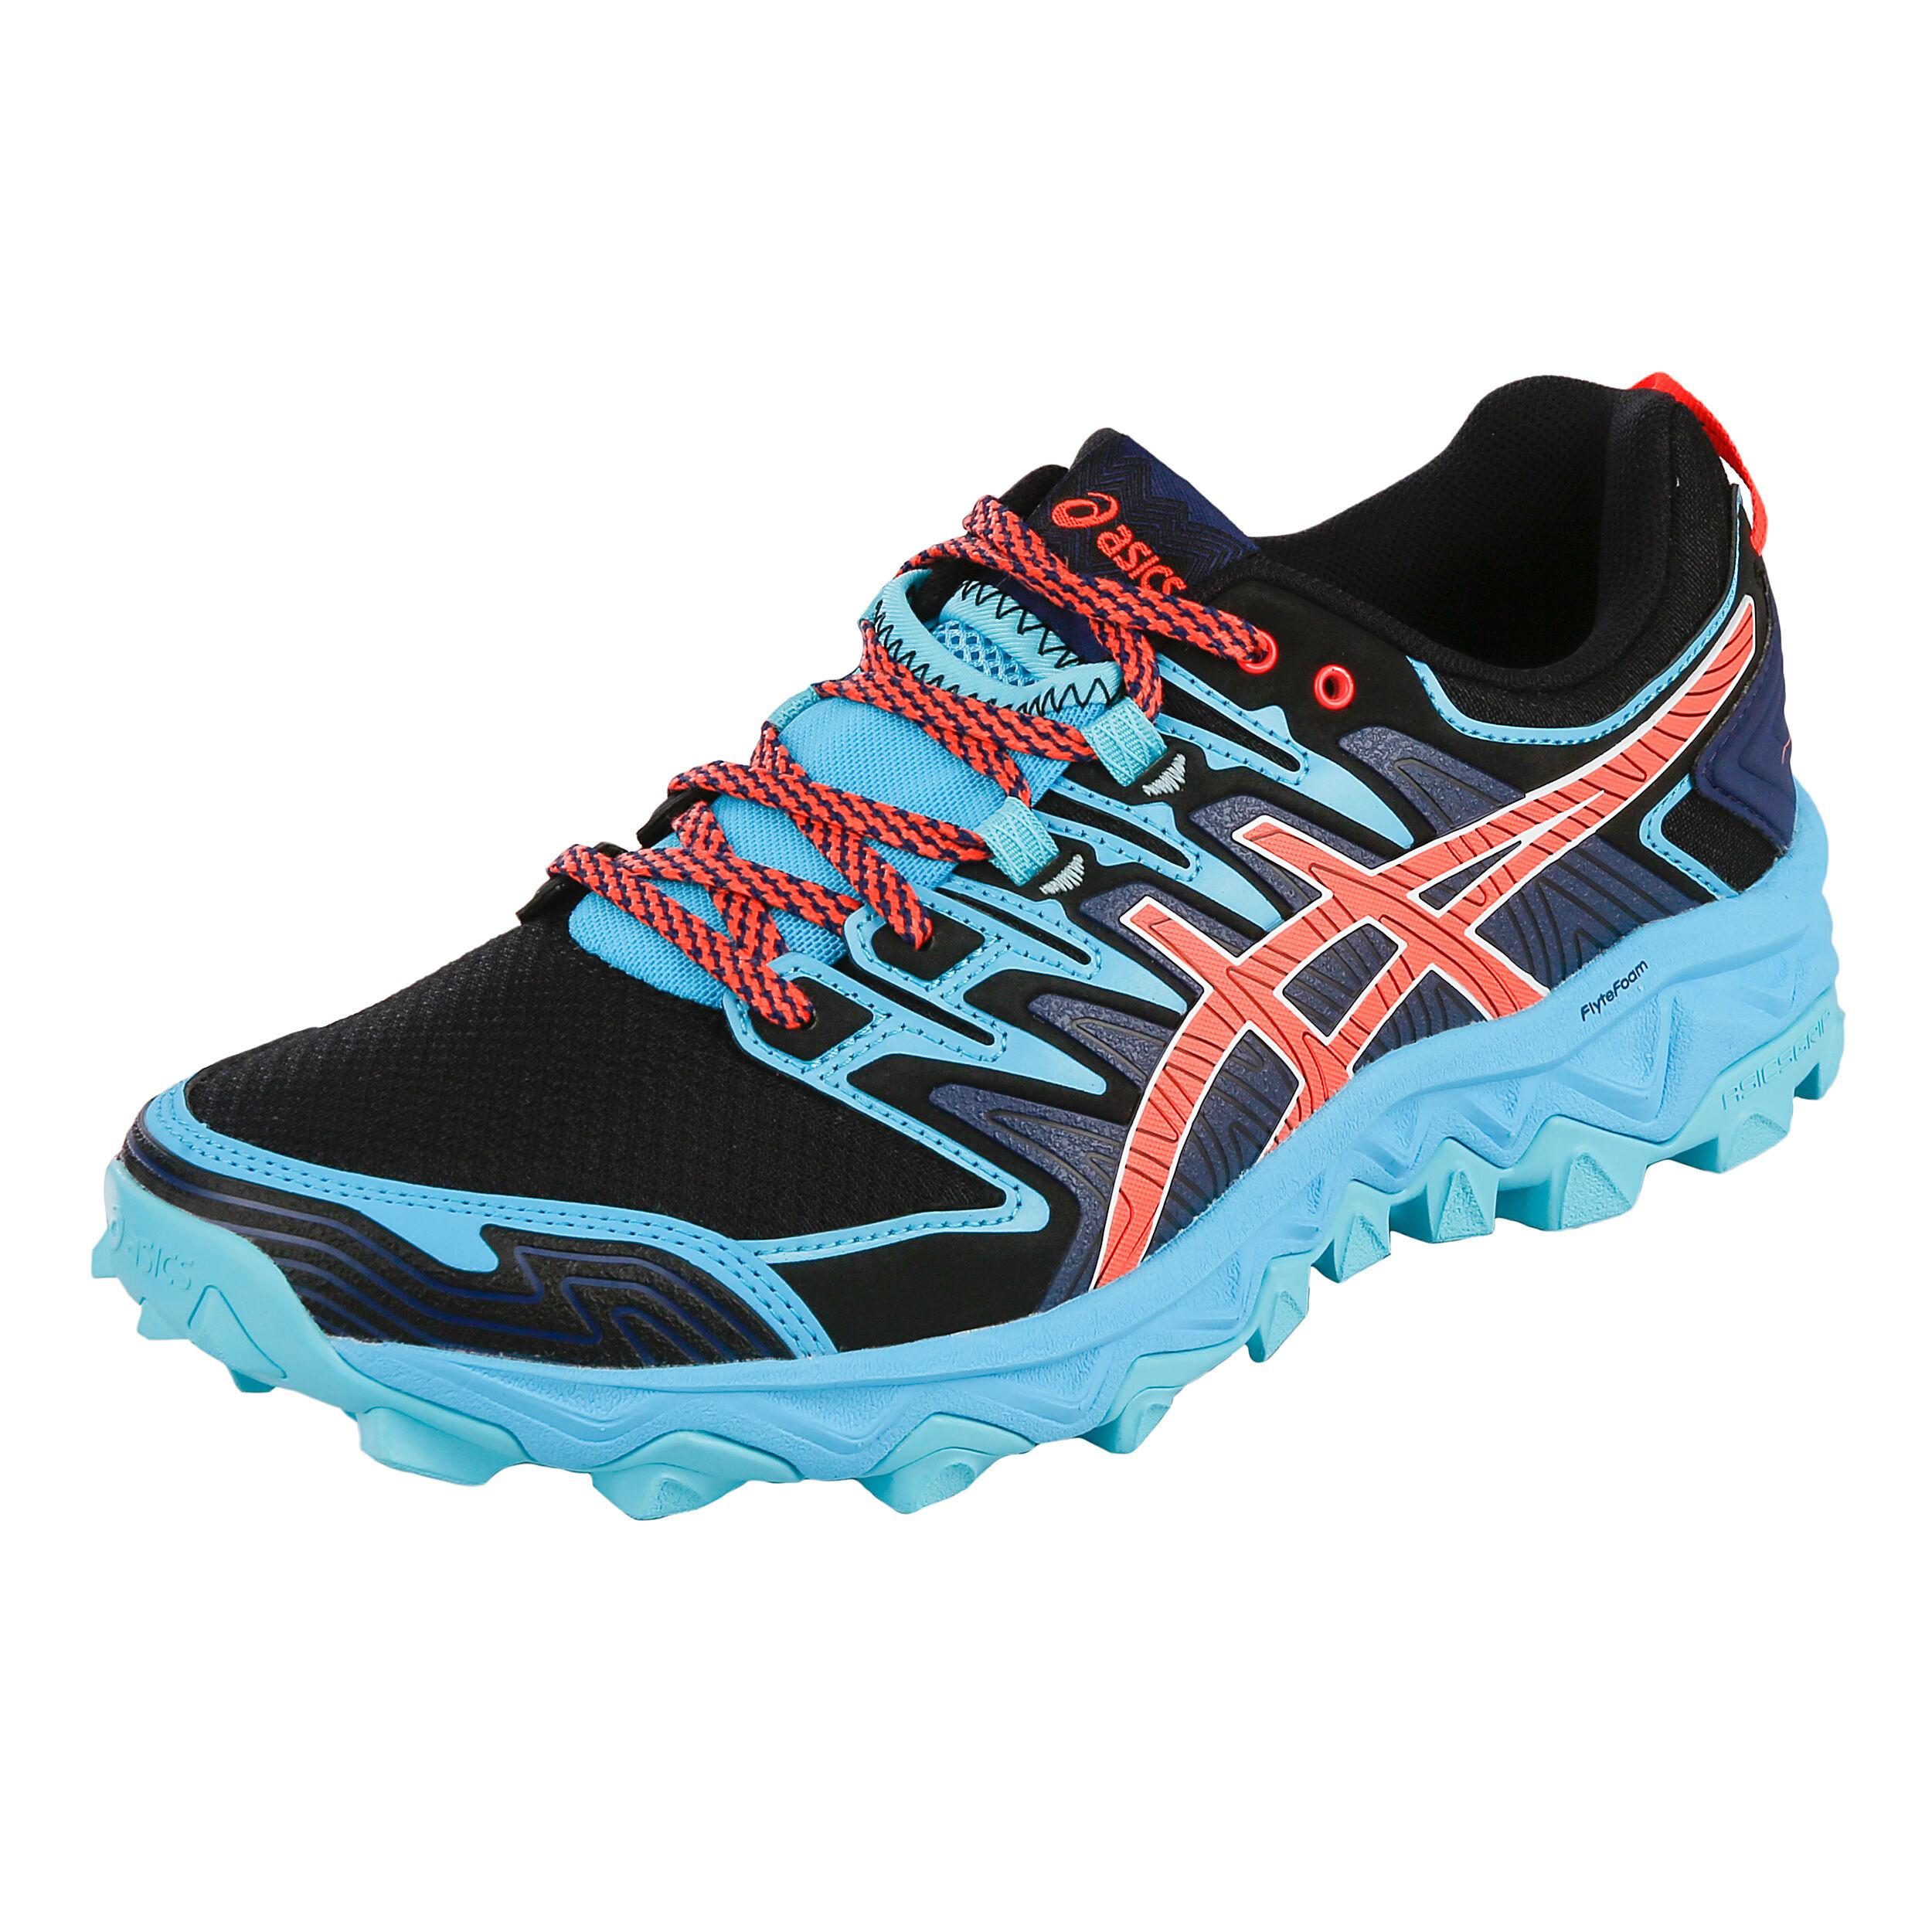 buy Asics Gel-Fuji Trabuco 7 Trail